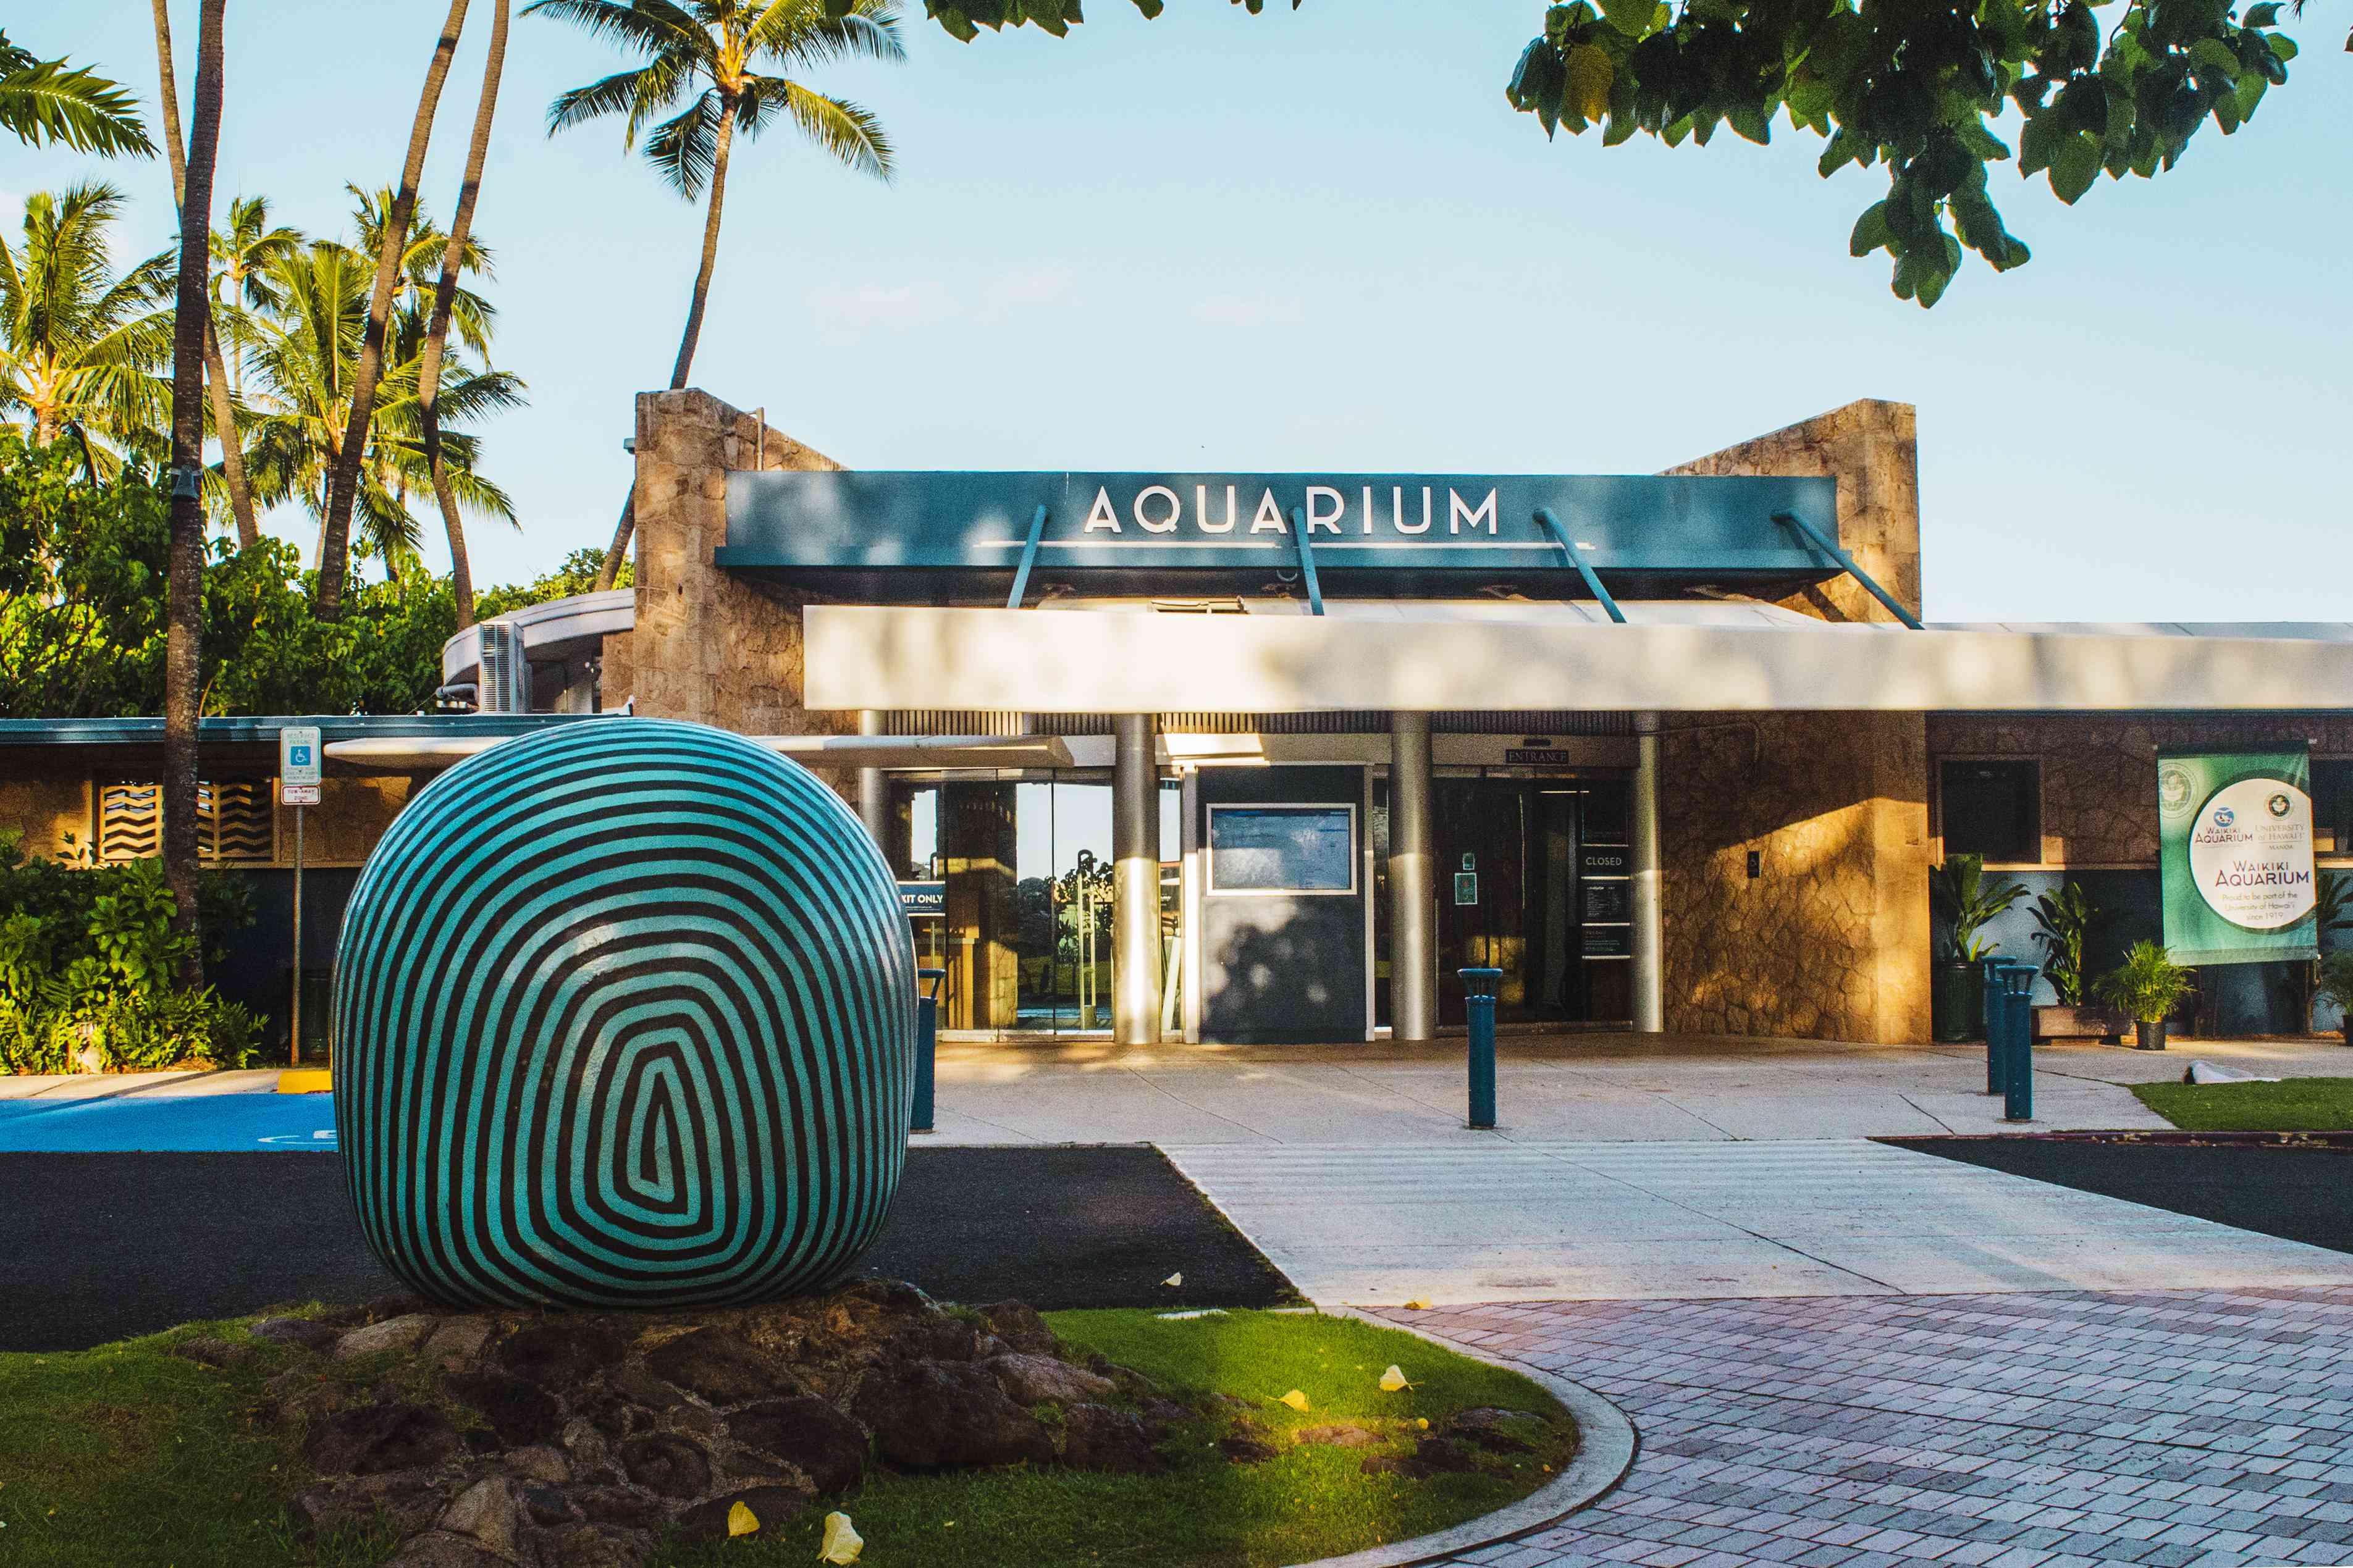 Entrance to Waikiki Aquarium